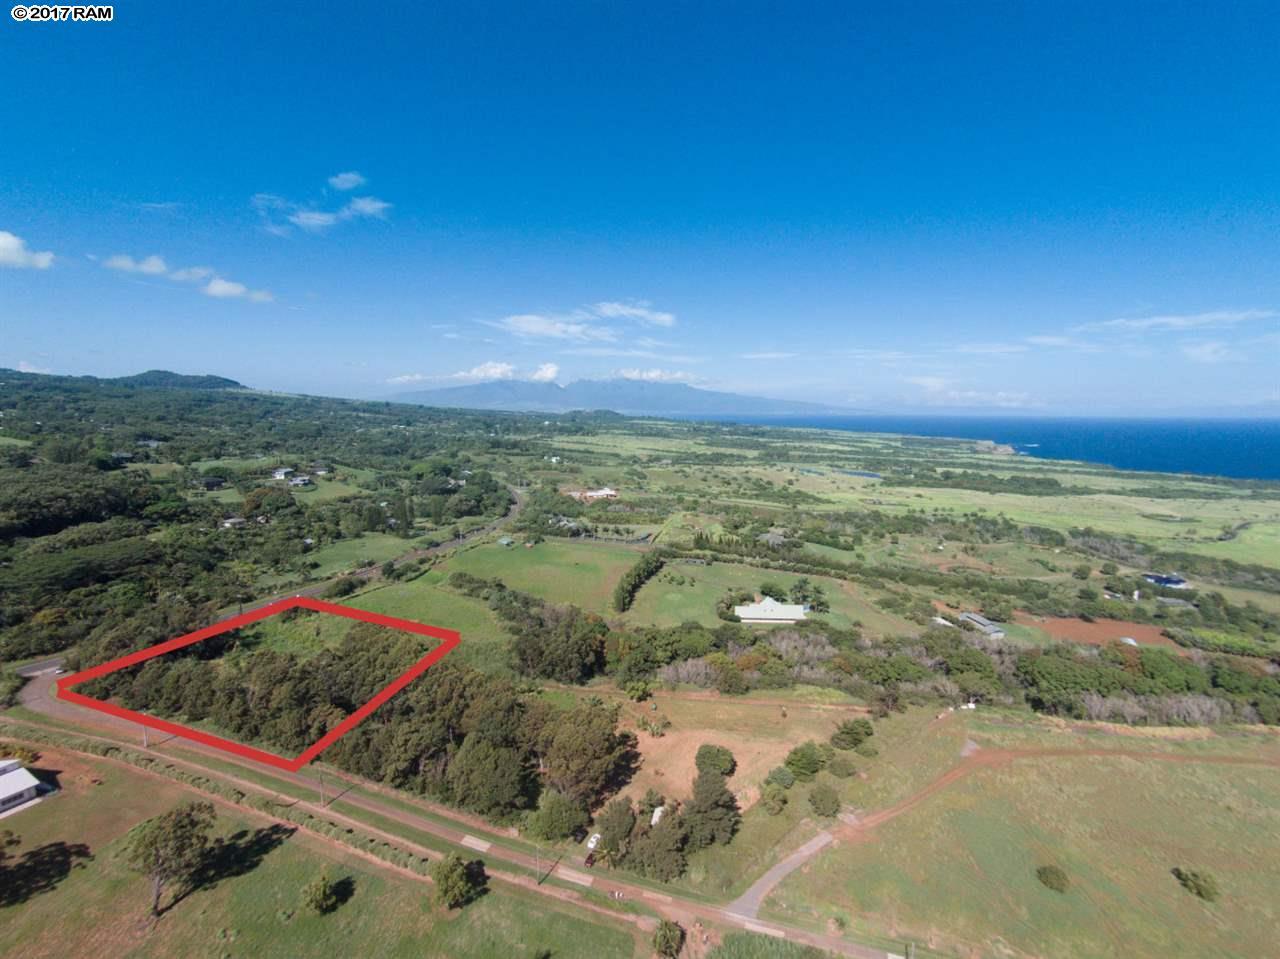 17 Manawai Pl Lot 1  Haiku, Hi 96708 vacant land - photo 2 of 4